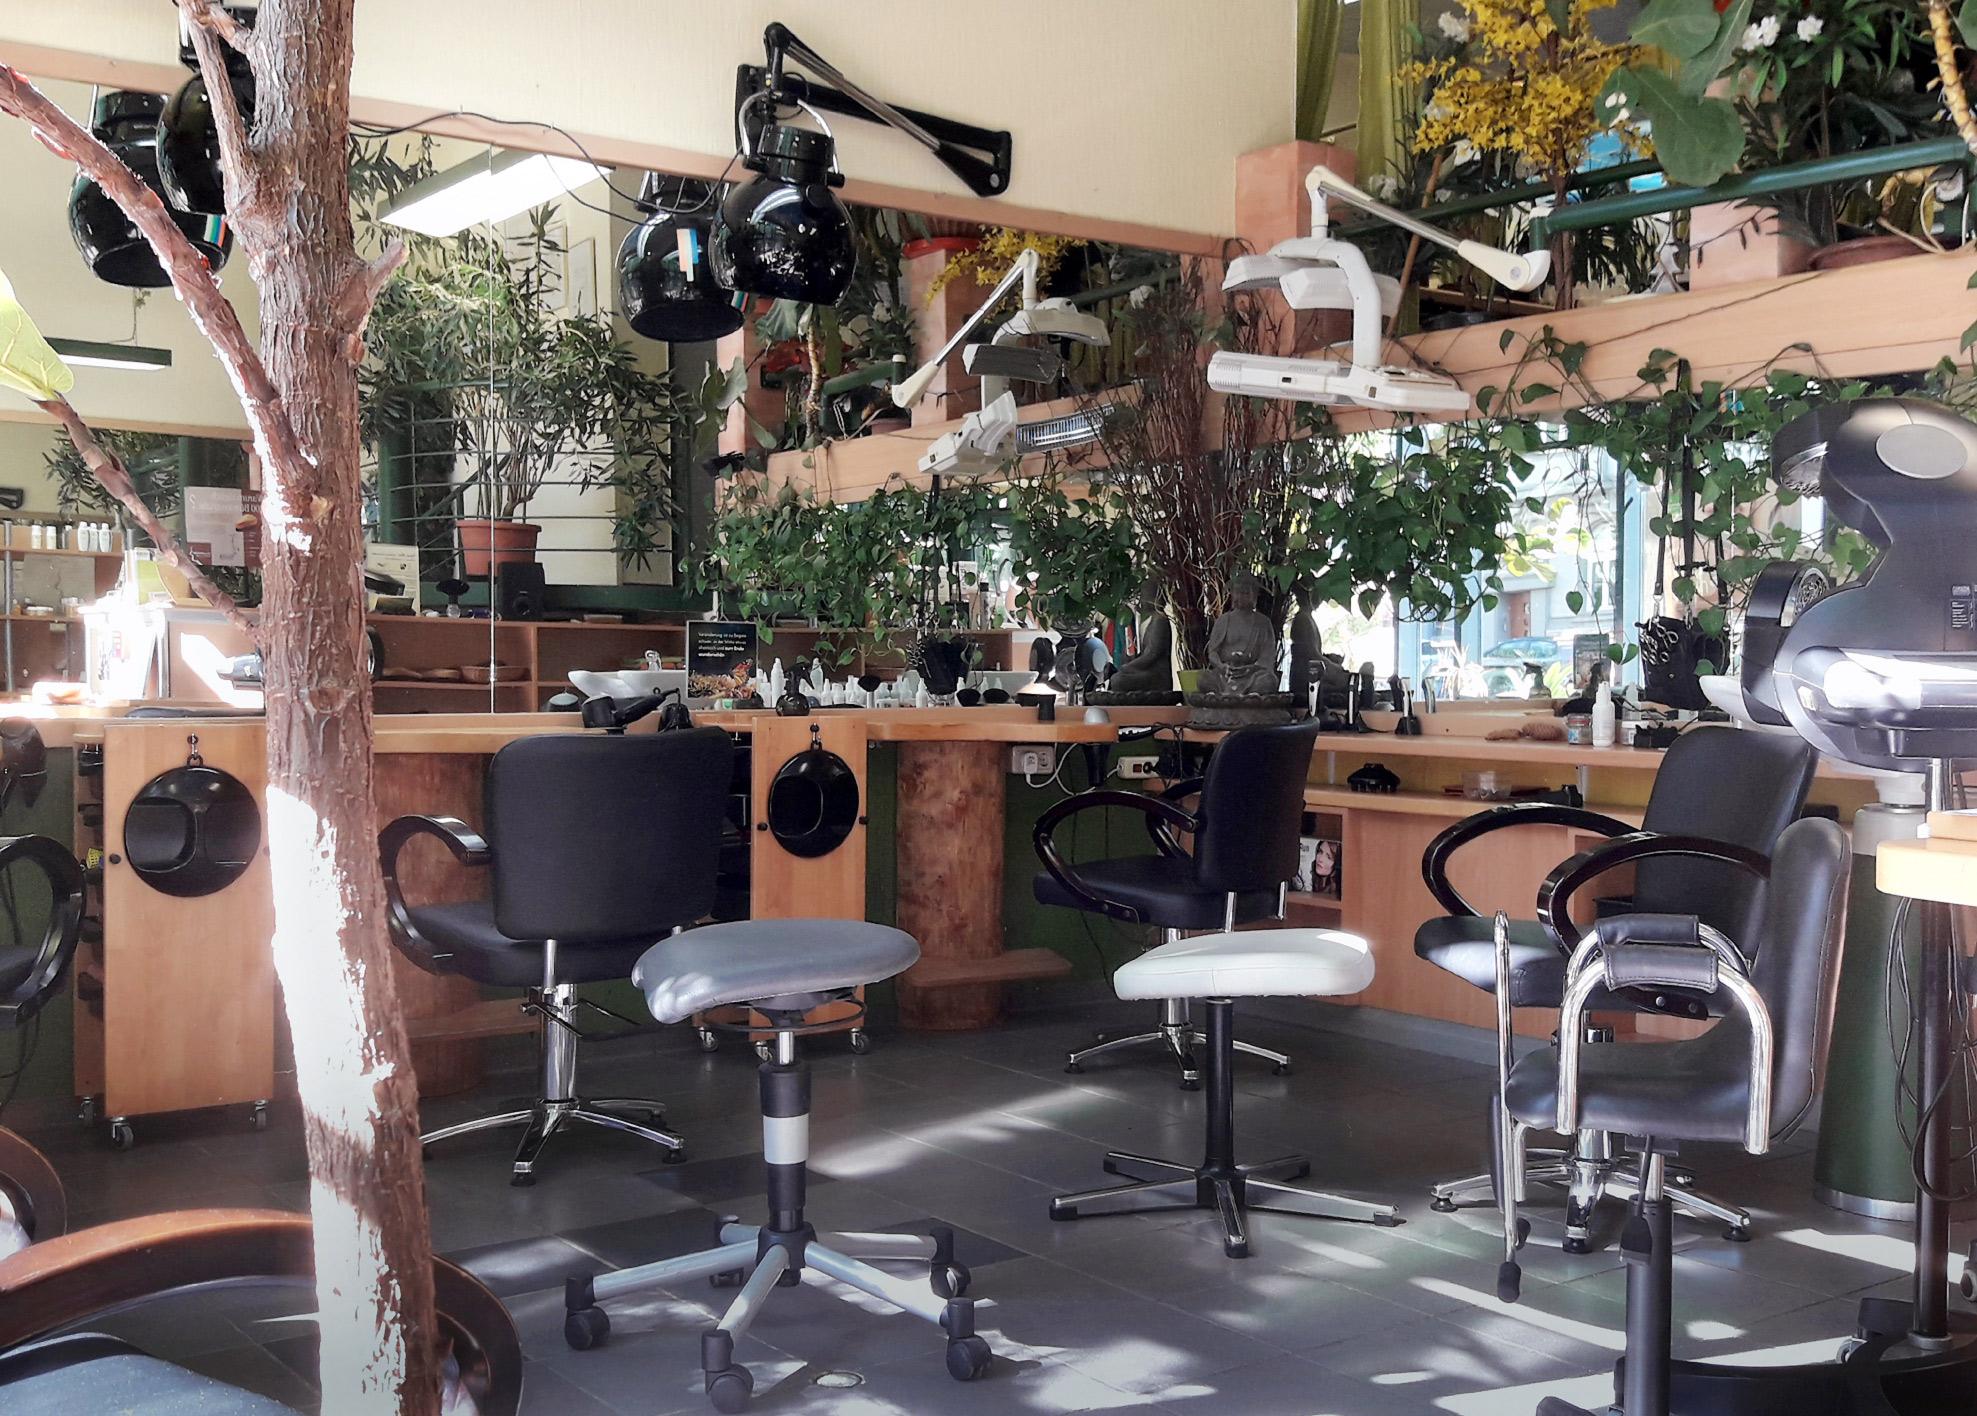 Friseur Salon: Melissa Frings Habsburgerallee 11 - 52064 Aachen